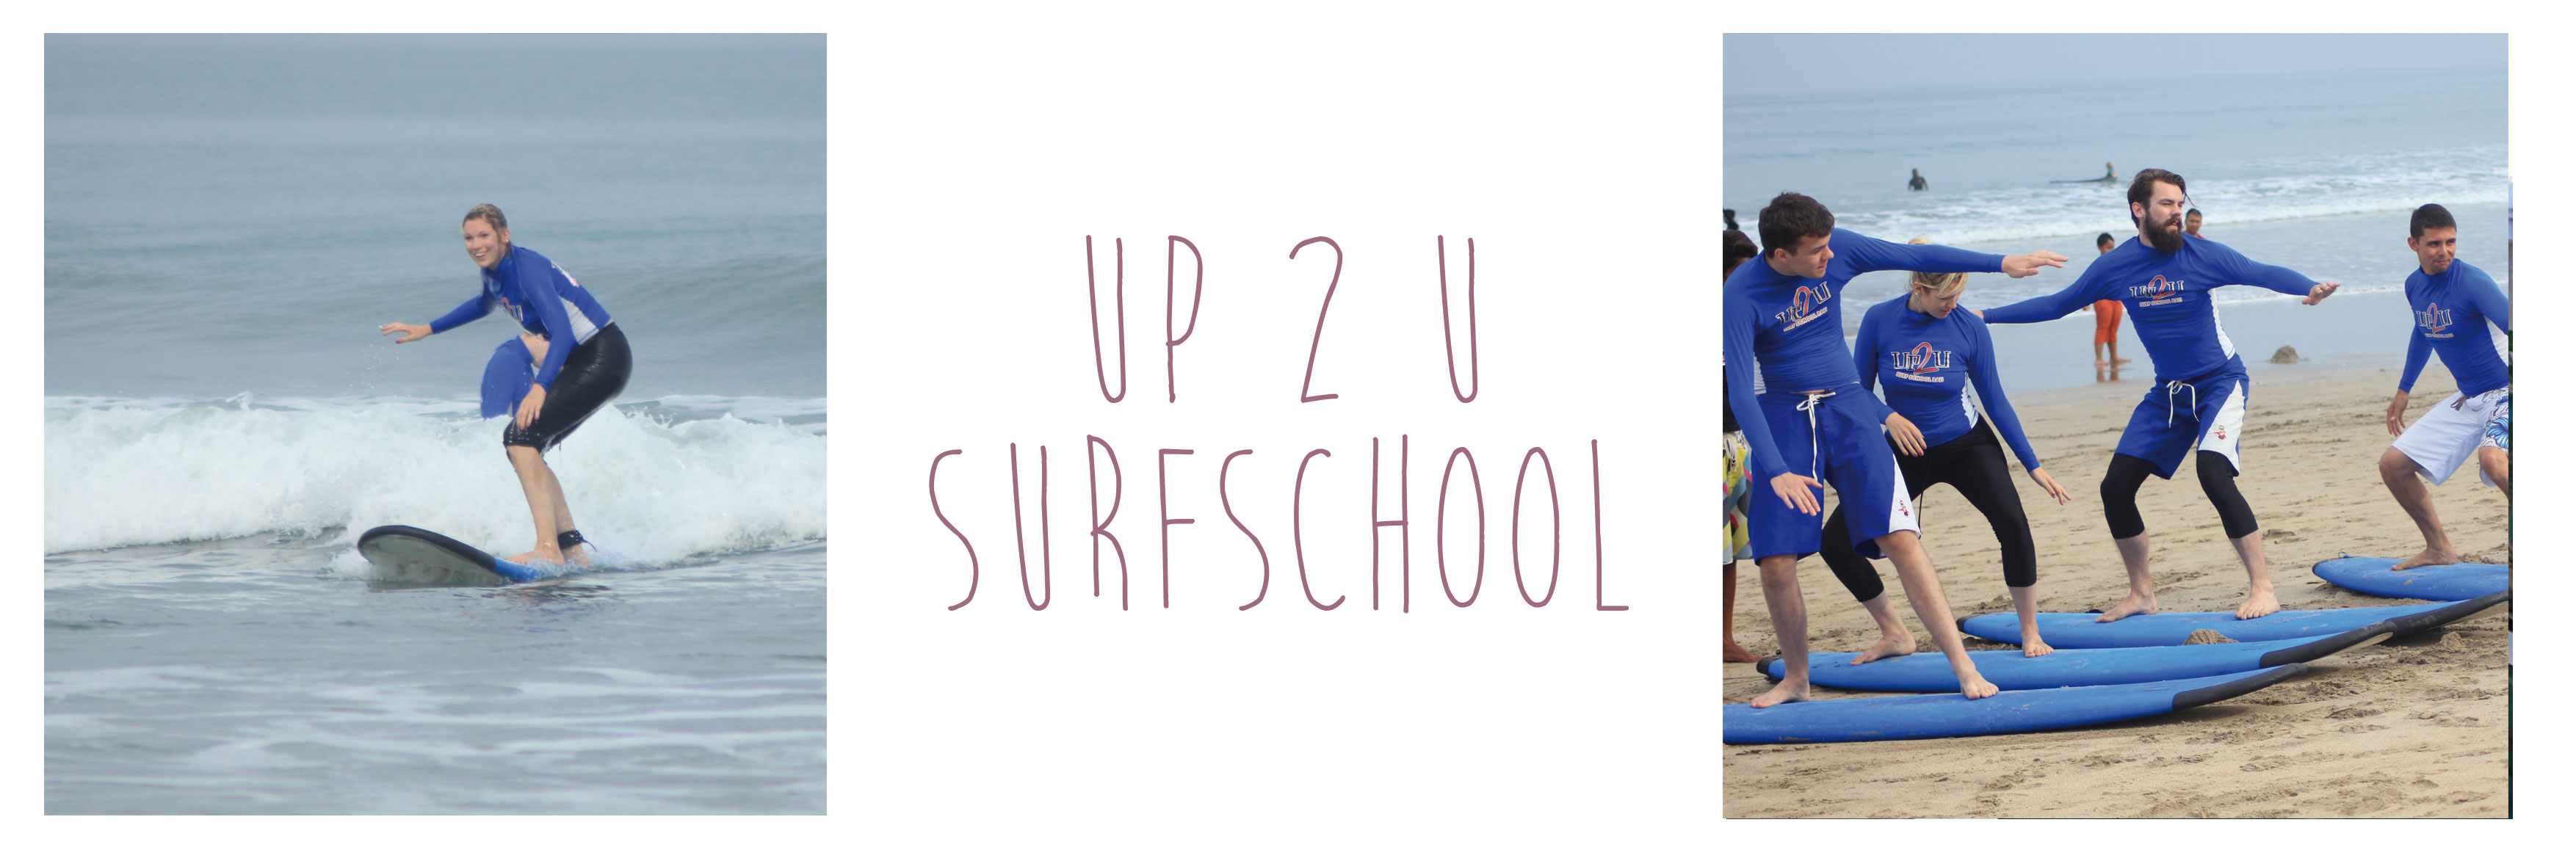 Up2USurfschool_clara-wolff.de